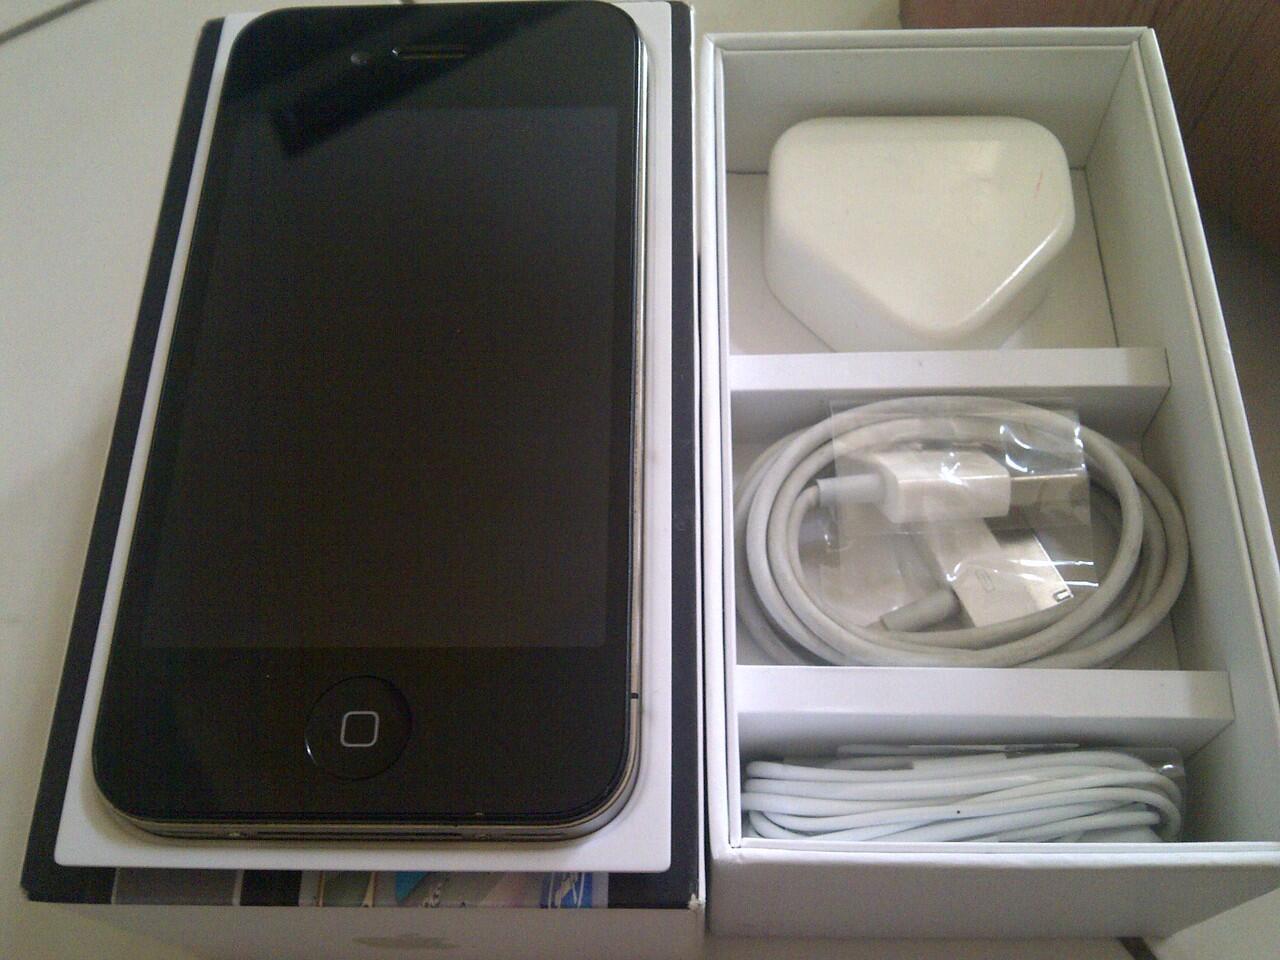 Jual Cepat Iphone 4G 32gb GSM Black MULUS